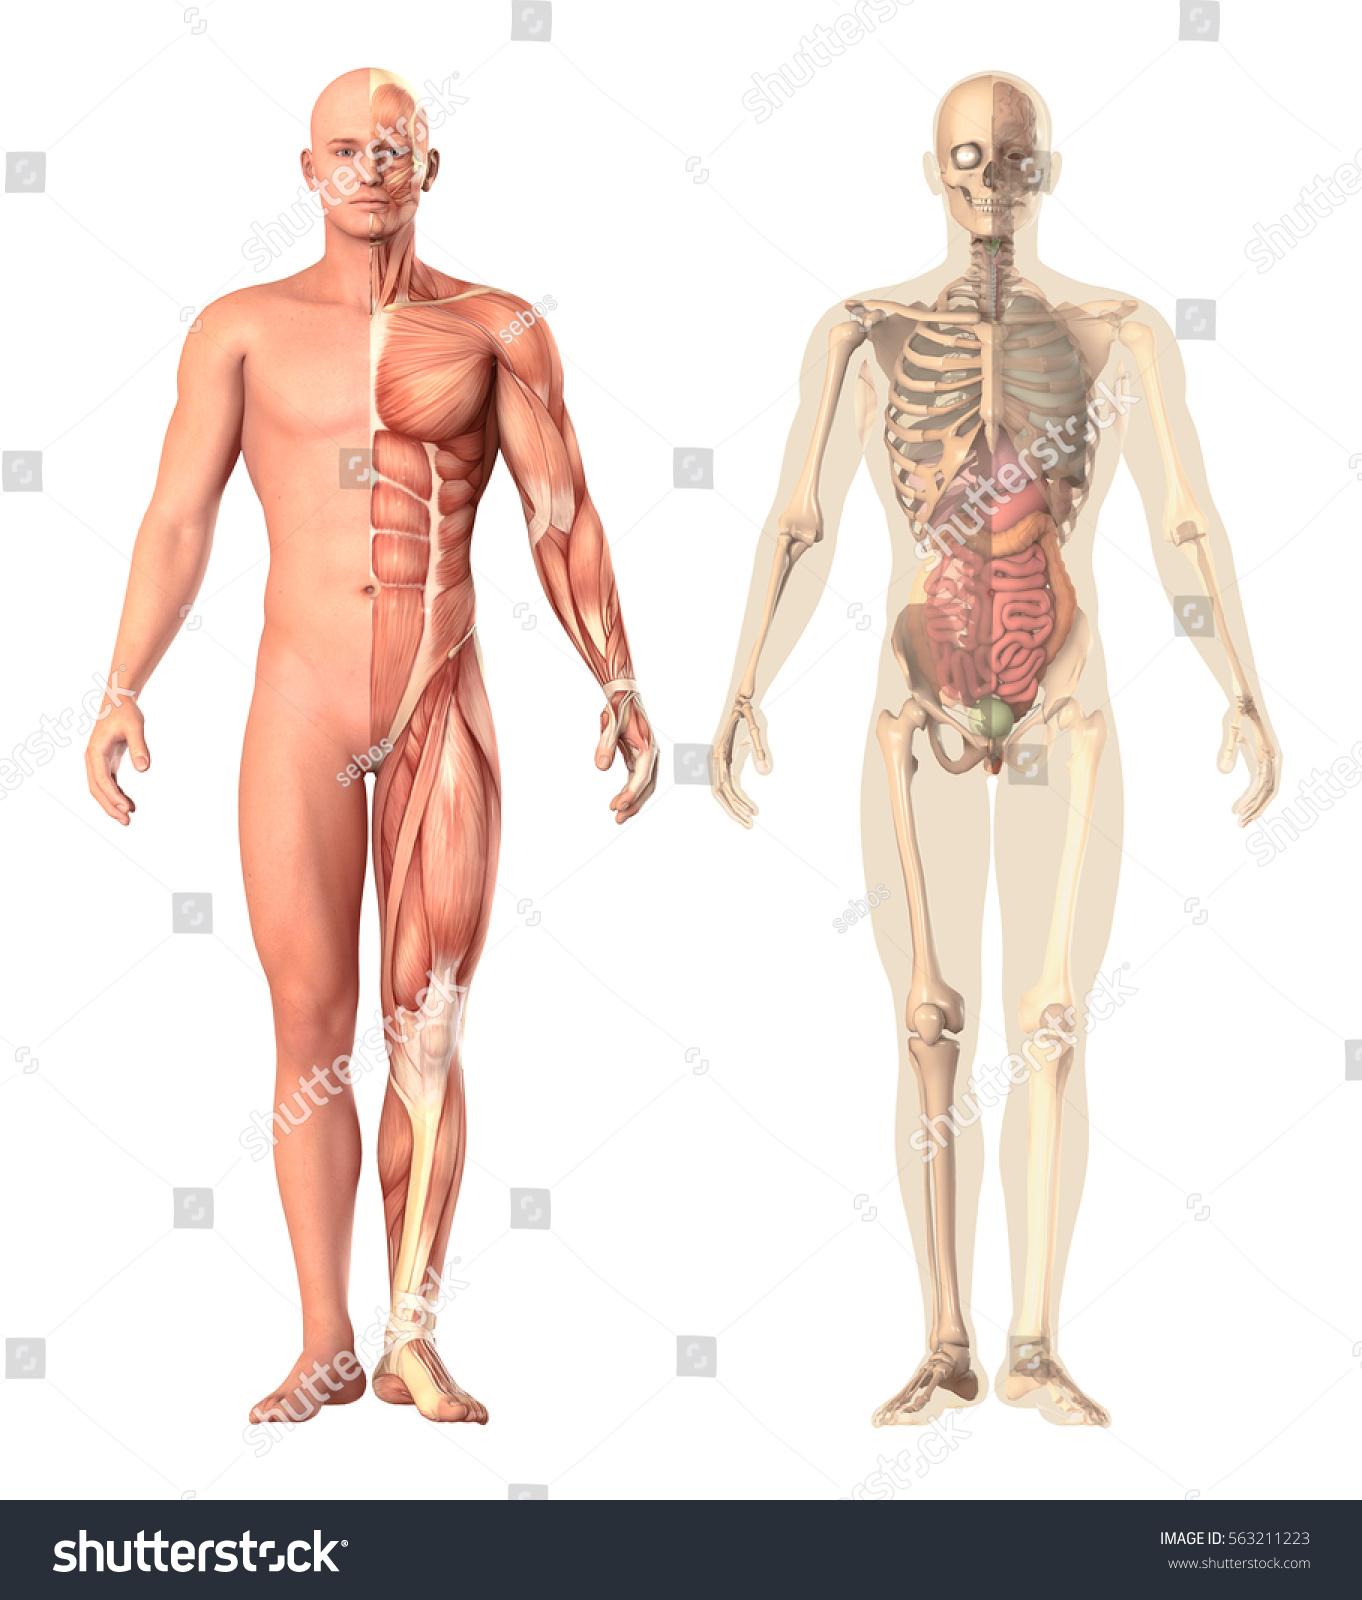 Medical Illustration Human Anatomy Transparency View Stock